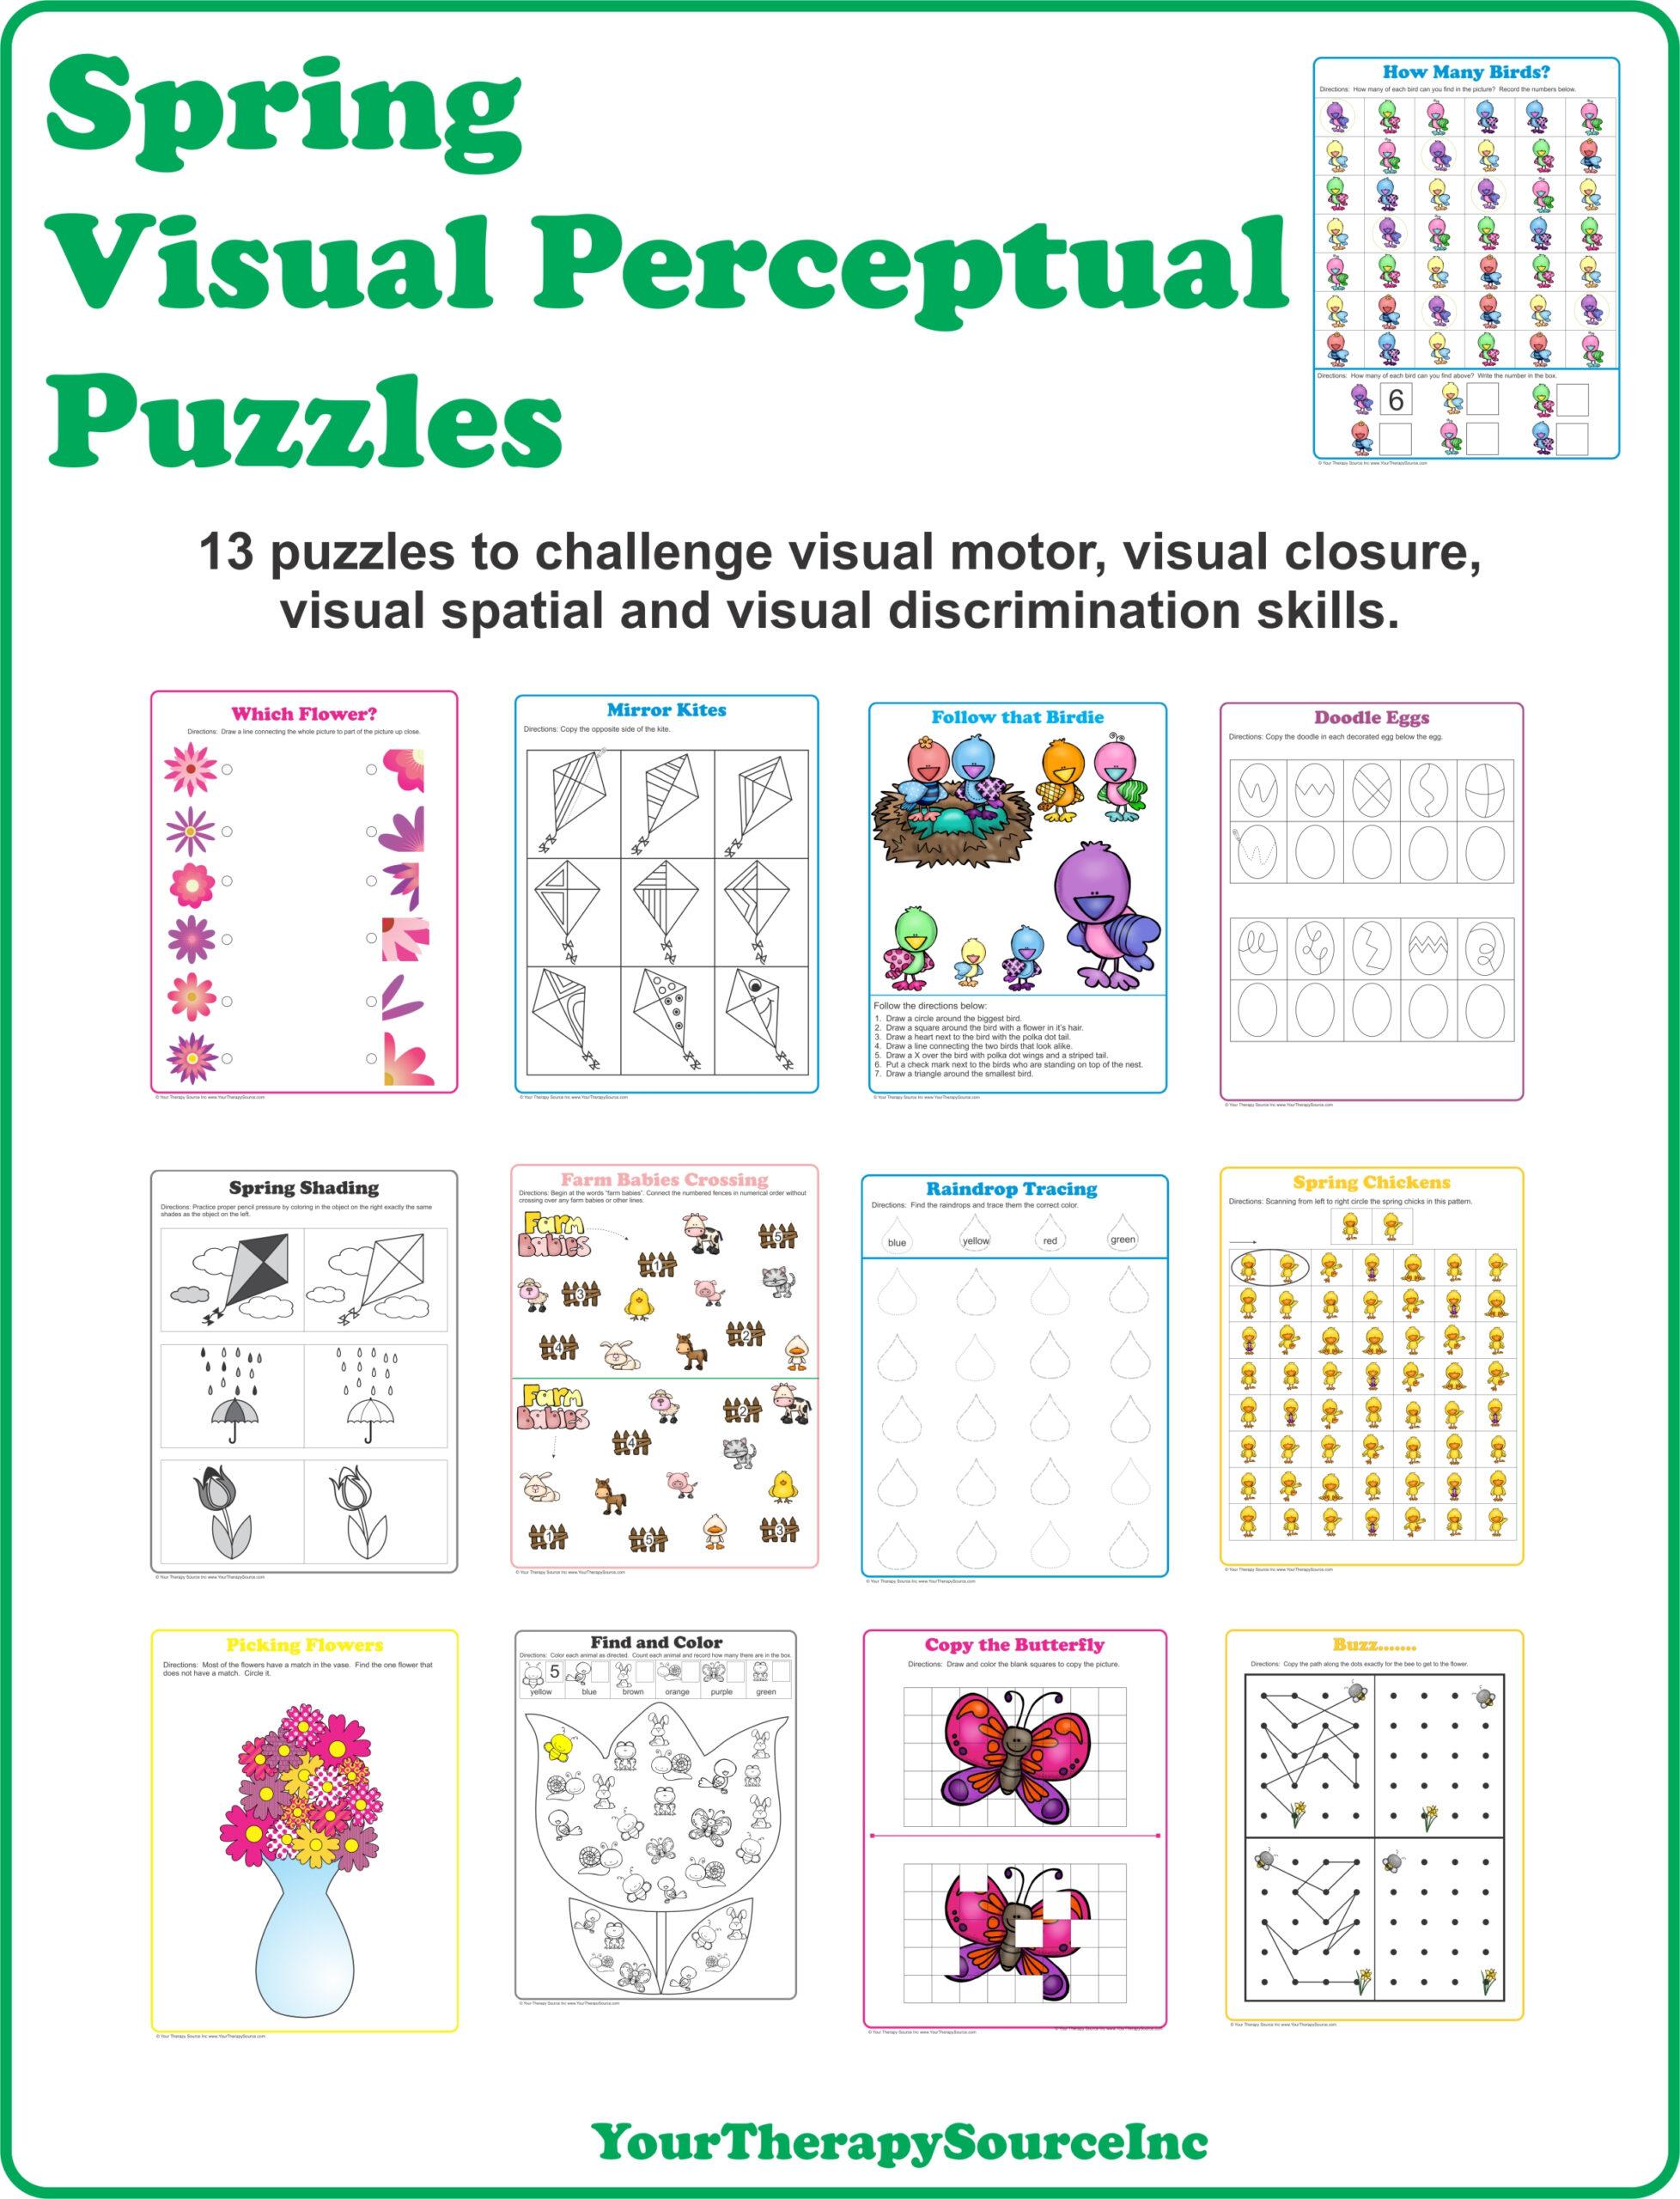 Spring Visual Perceptual Puzzles